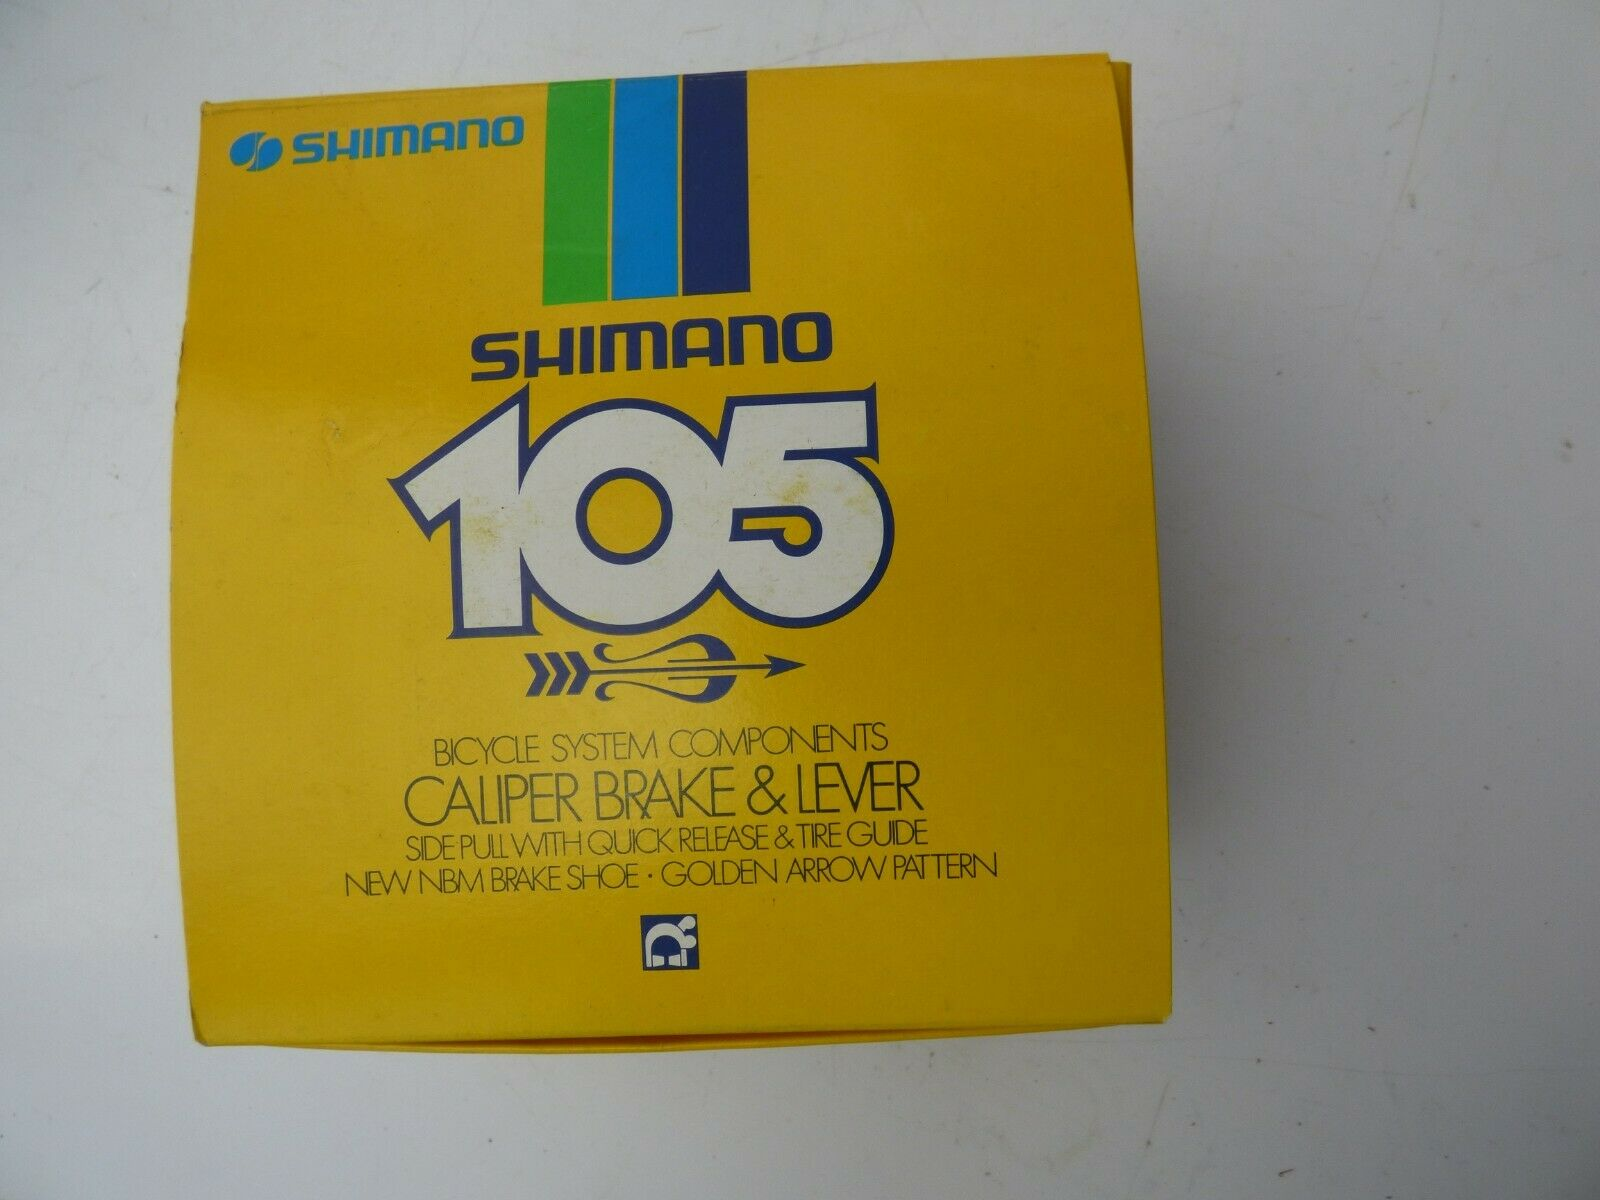 SHIMANO 105 oroEN ARROW BRS105  BLH105 BRAKE SET  NOS  NIB